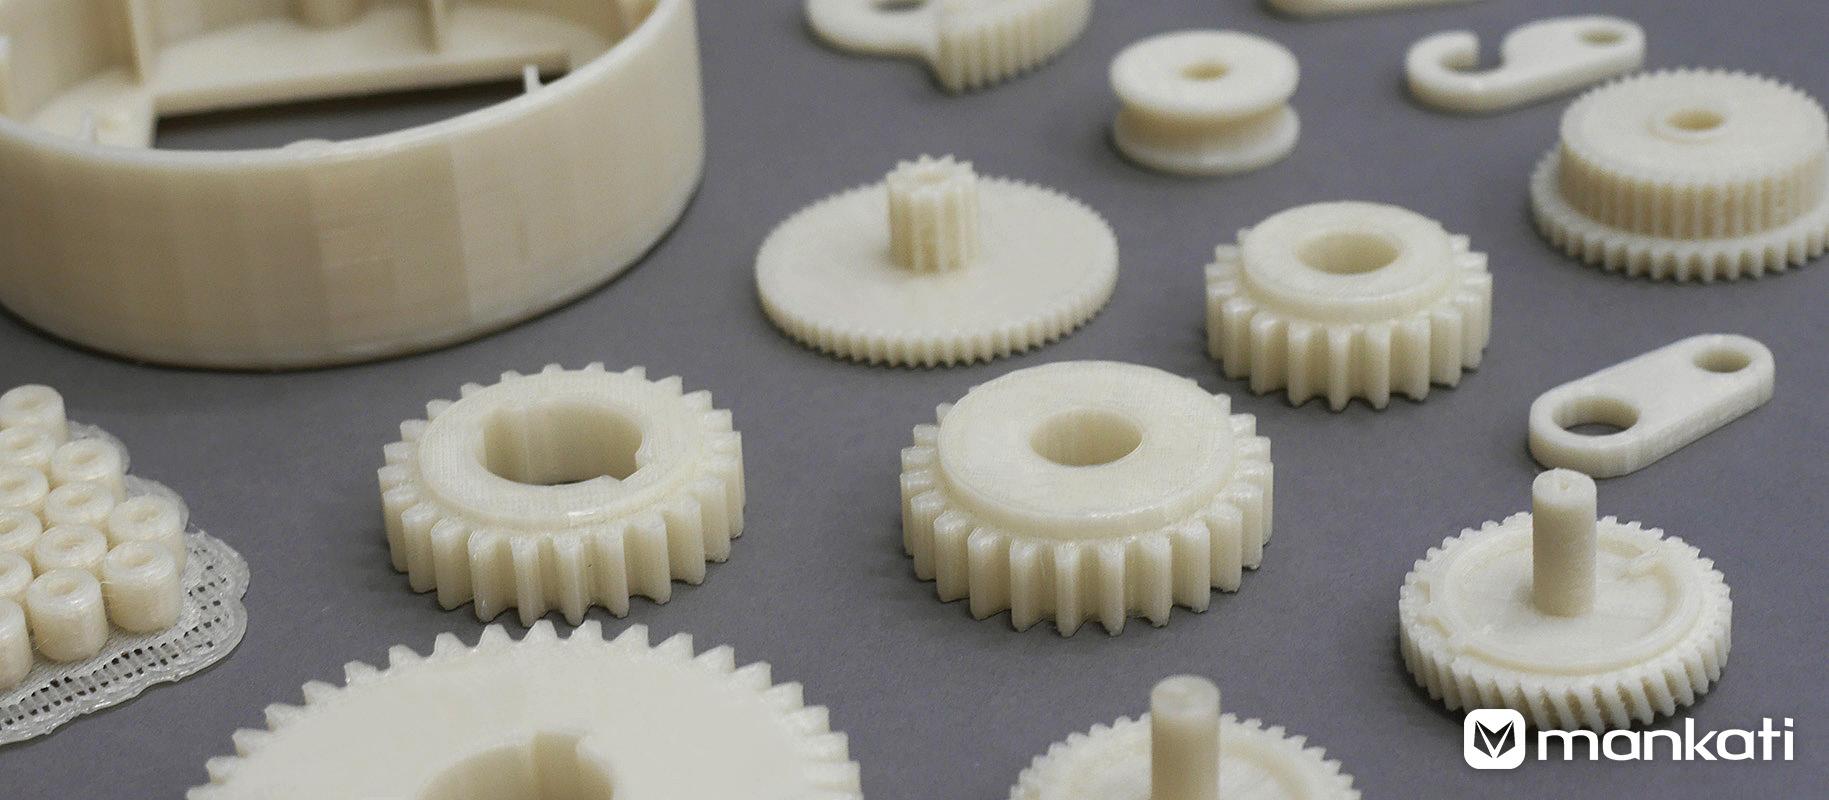 Mankati, Mankati 3D打印机, 尼龙3D打印机,尼龙材料,尼龙66,尼龙12,尼龙桌面级3D打印机,大尺寸打印机,工业级打印机